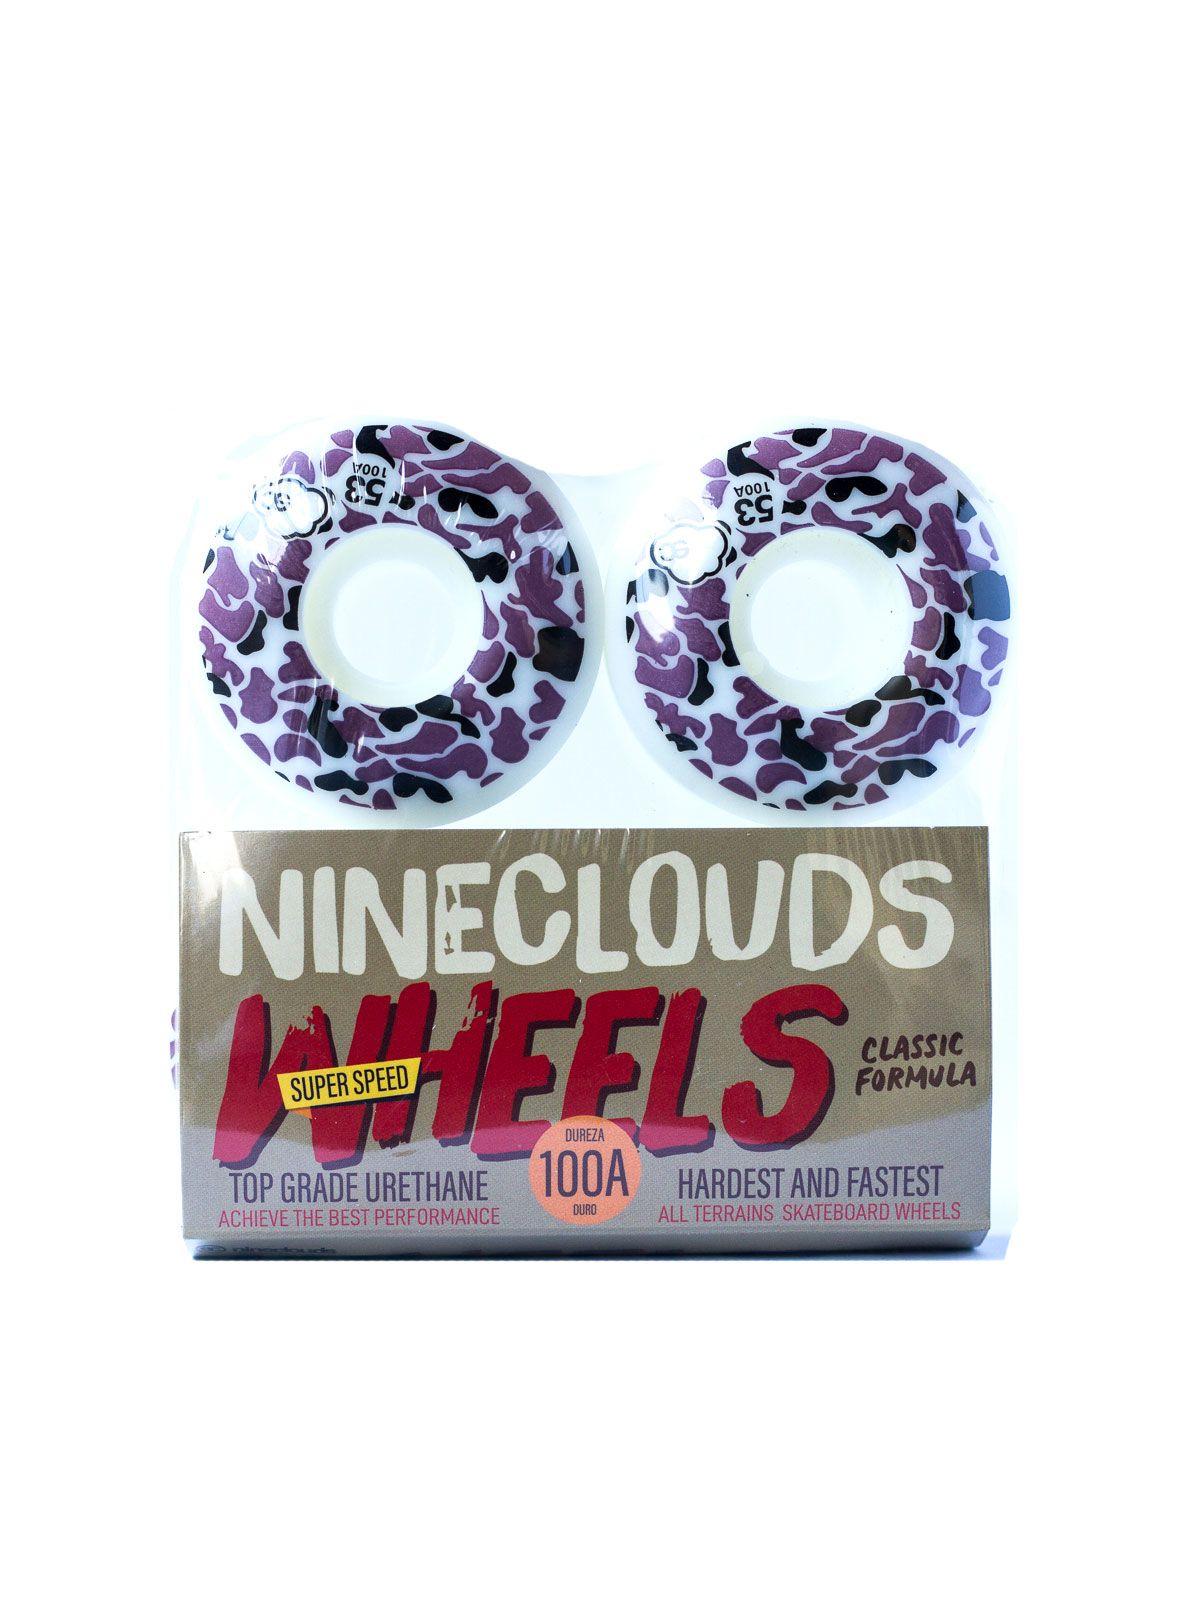 rodas-nineclouds-camo-53-2-image